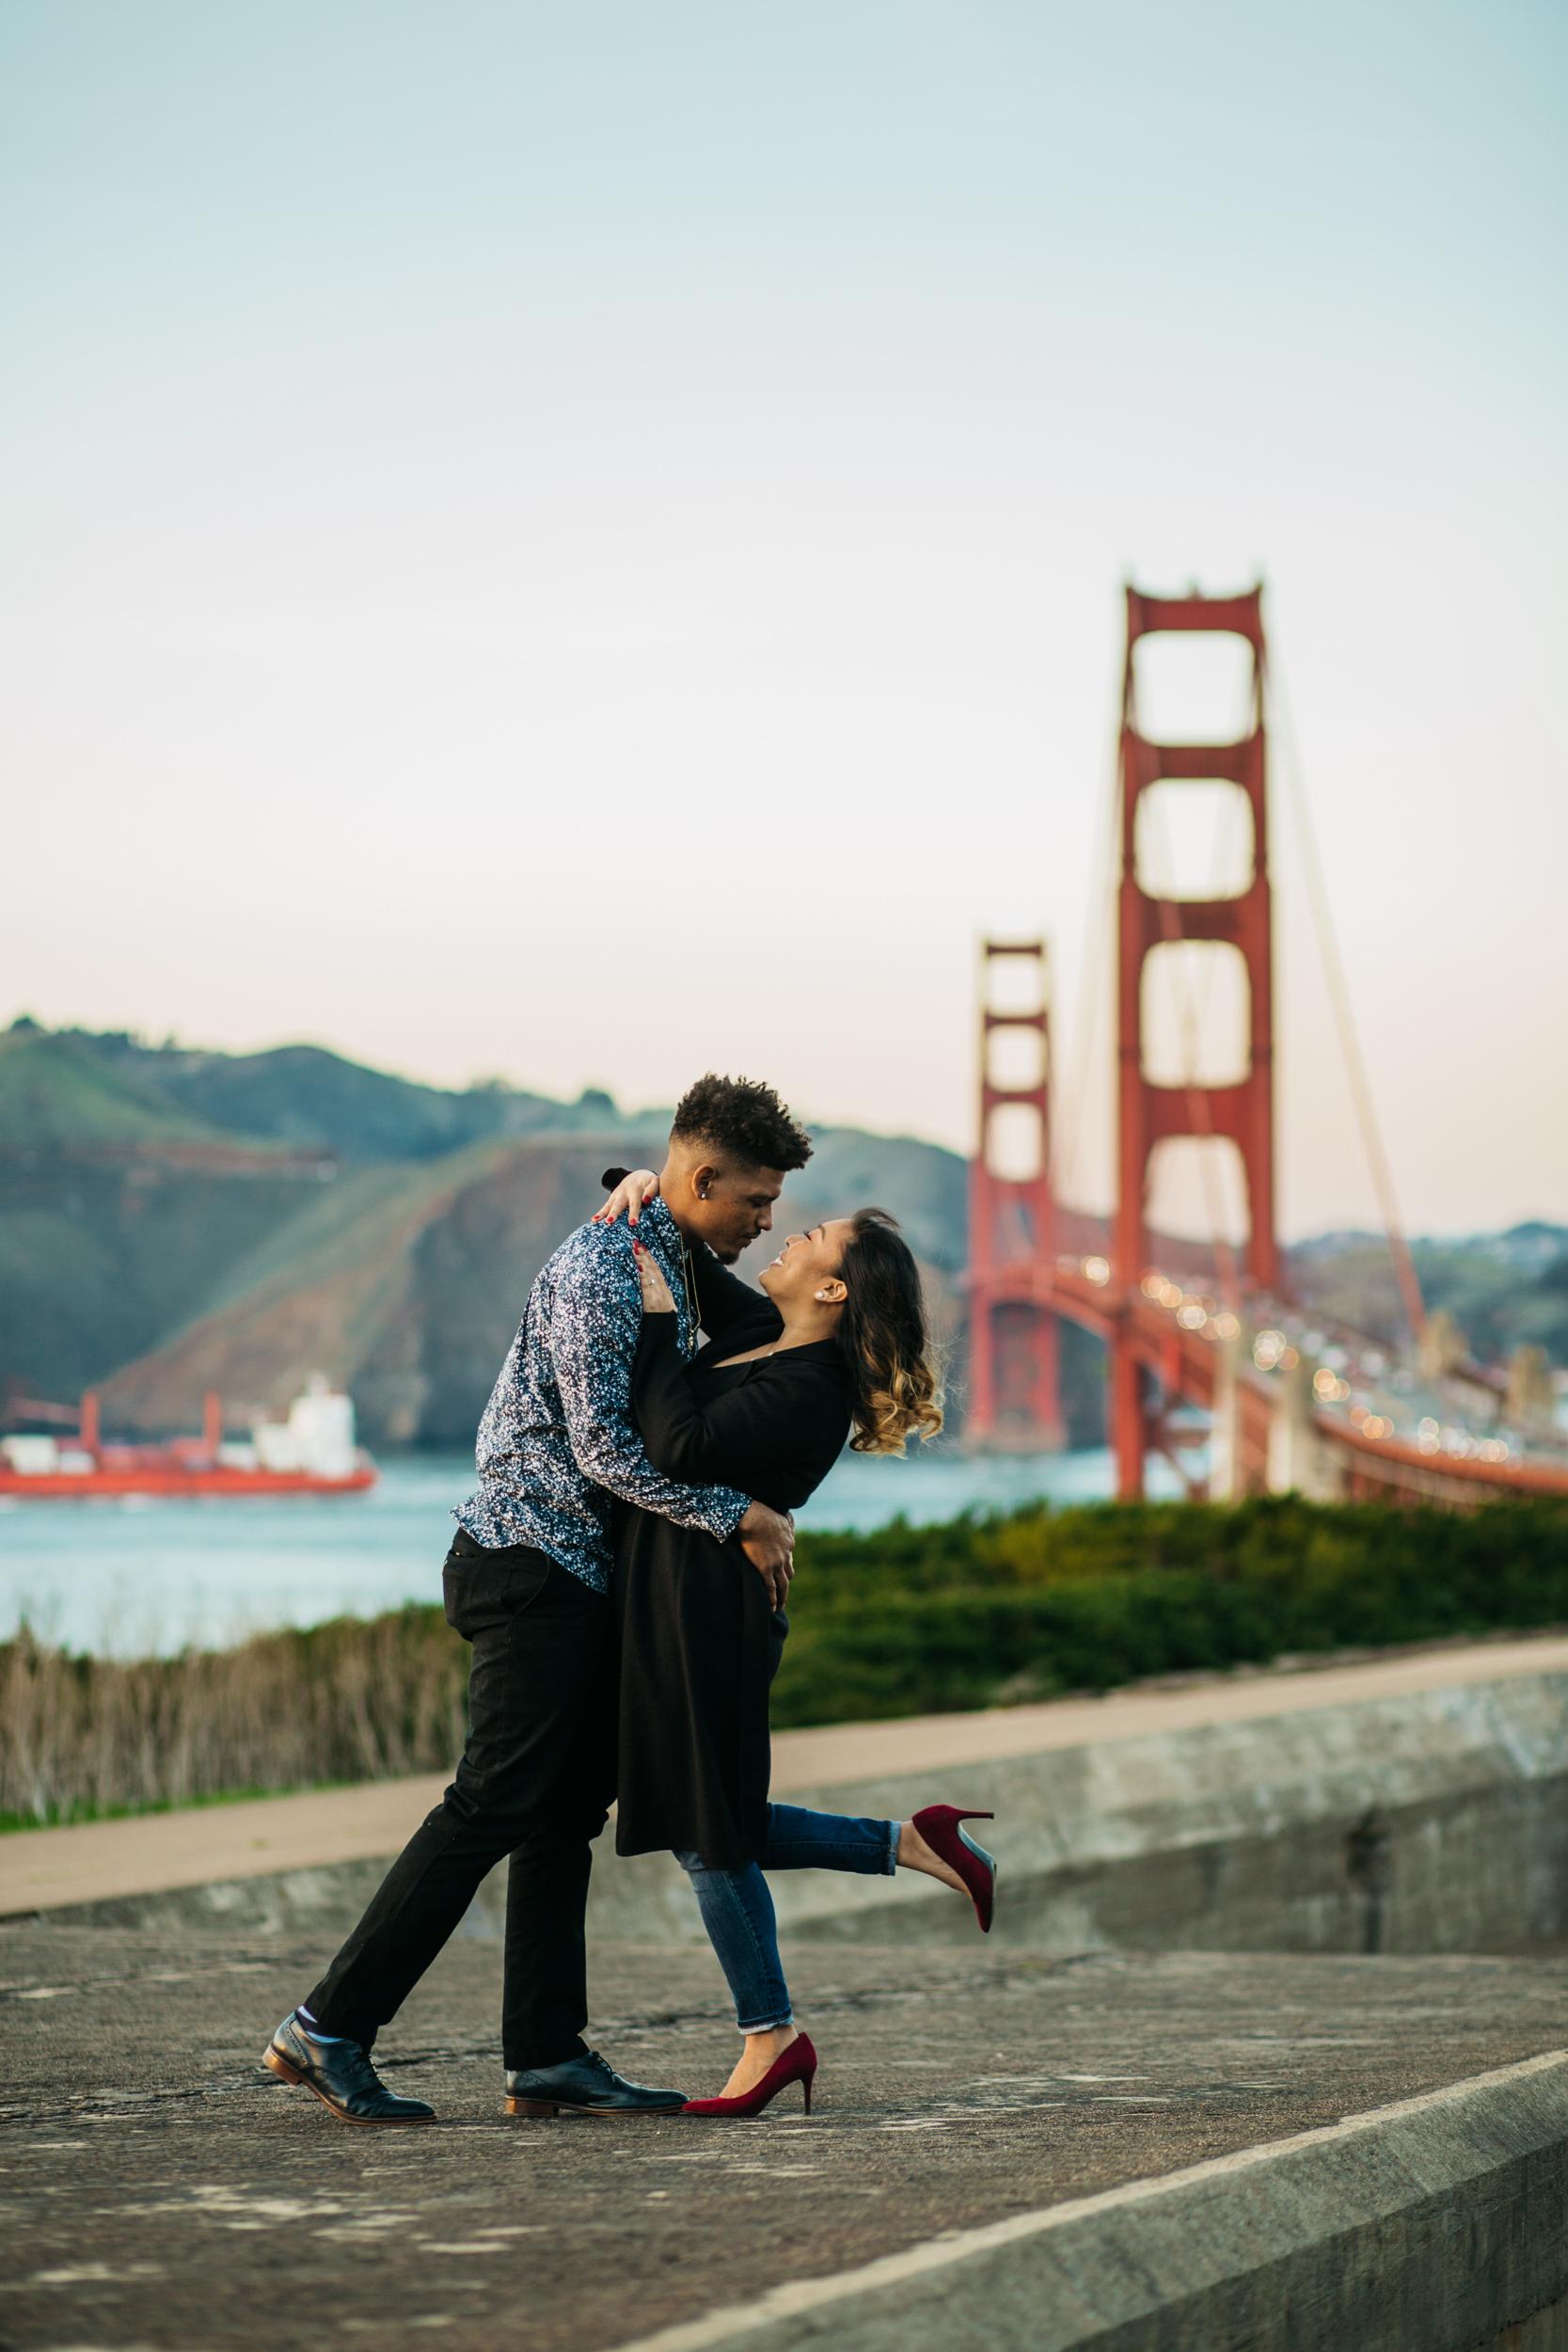 Engagement Photos-Ranalla Photo and Films-32.jpg